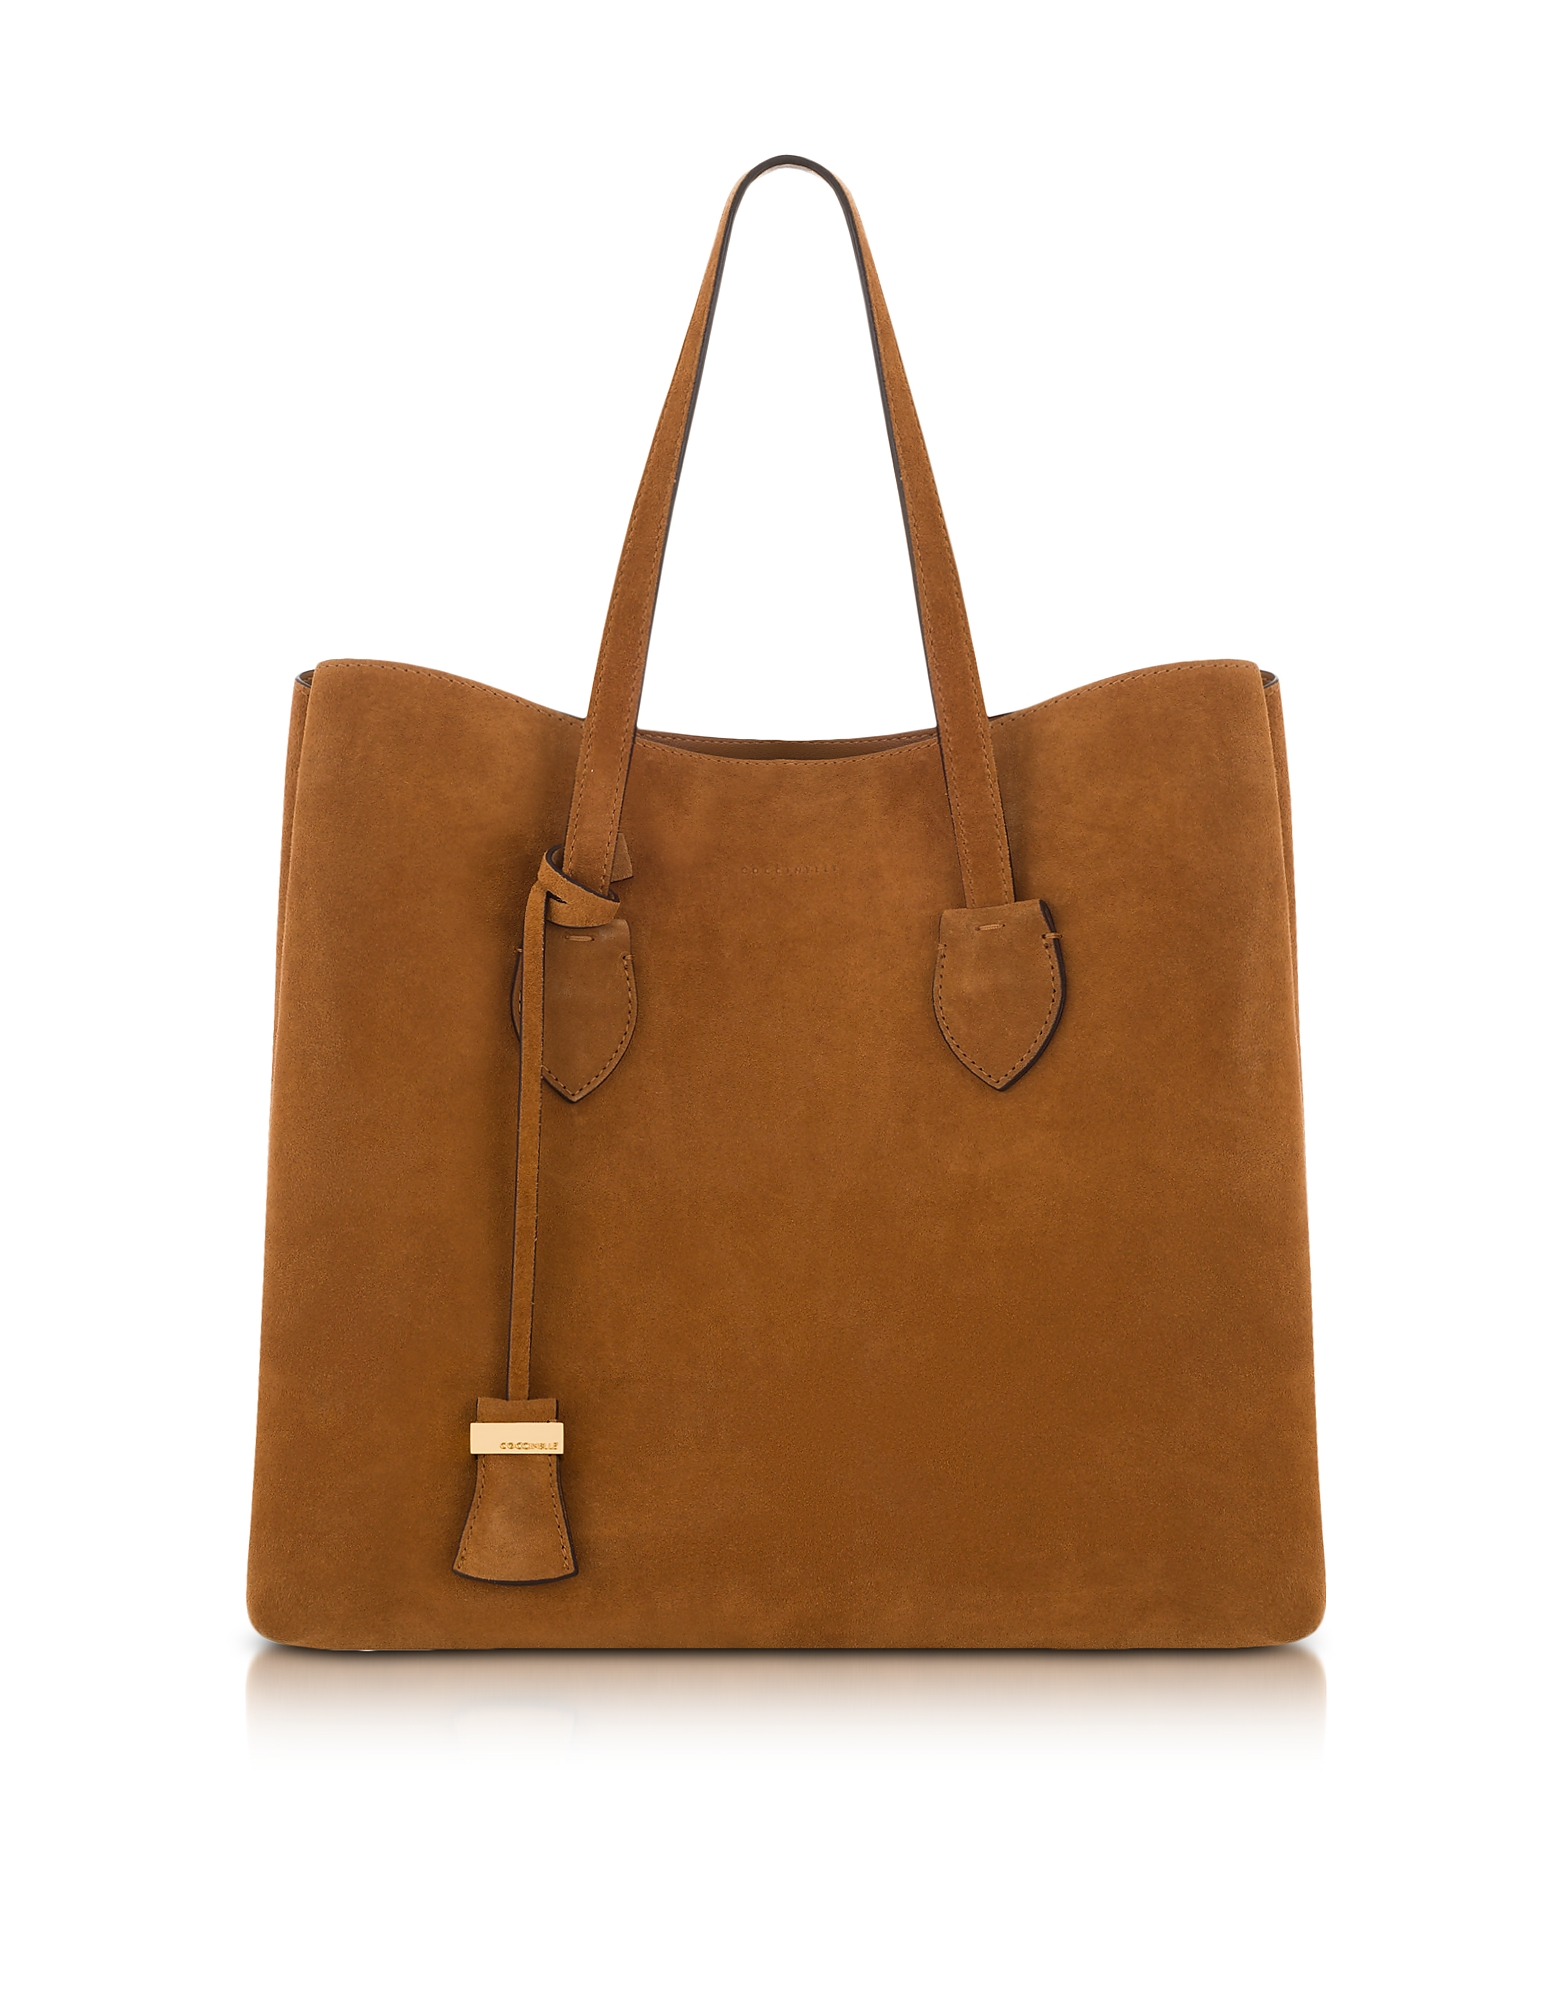 Coccinelle Handbags, Celene Brown Suede Tote Bag